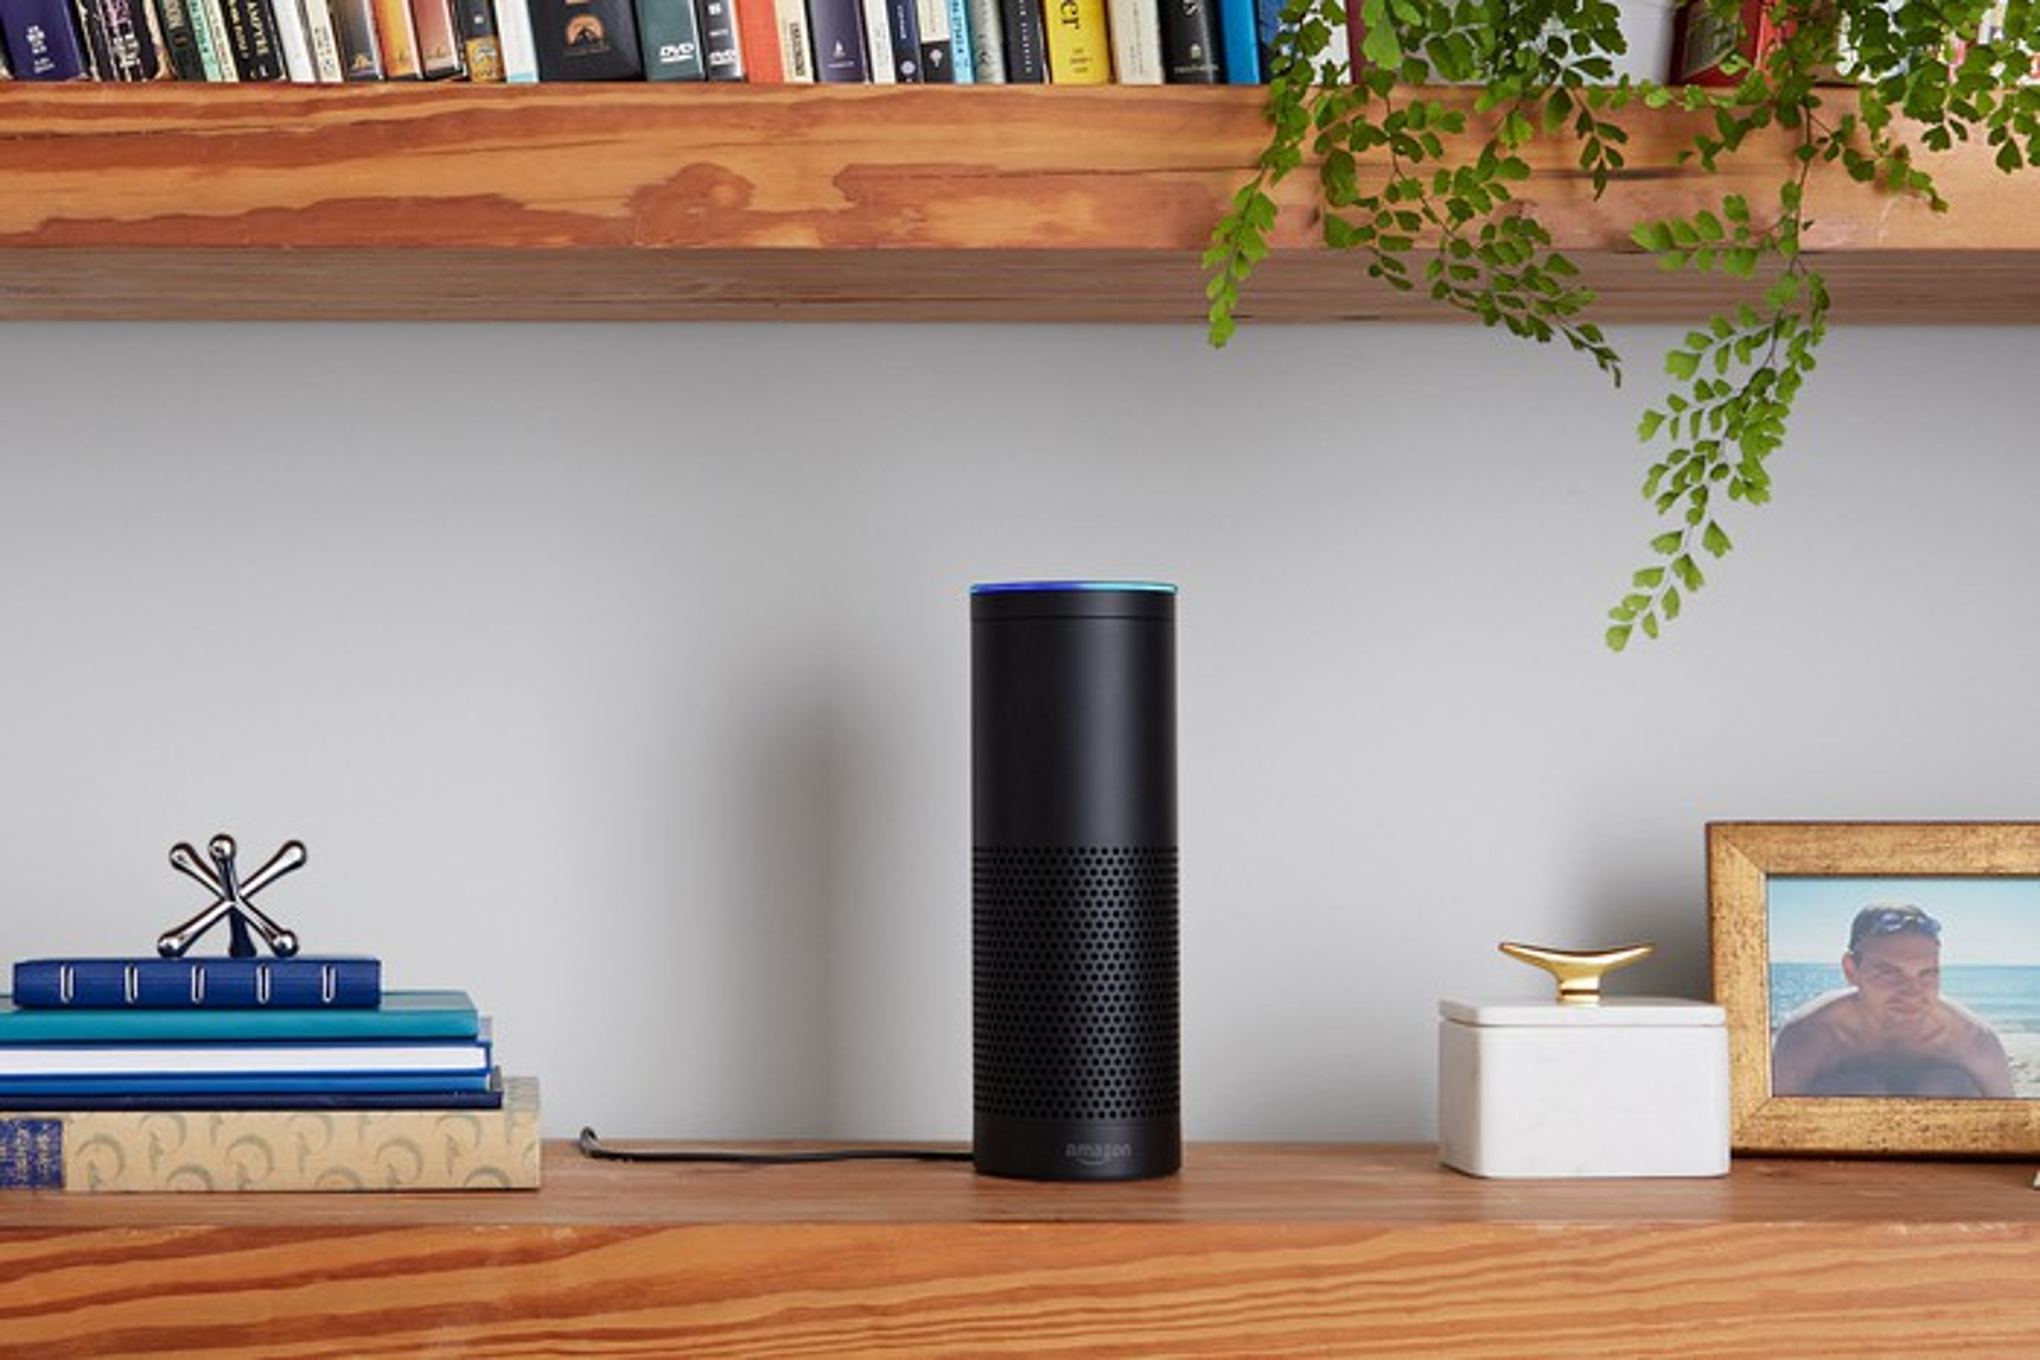 An Echo smart home speaker on a bookshelf.